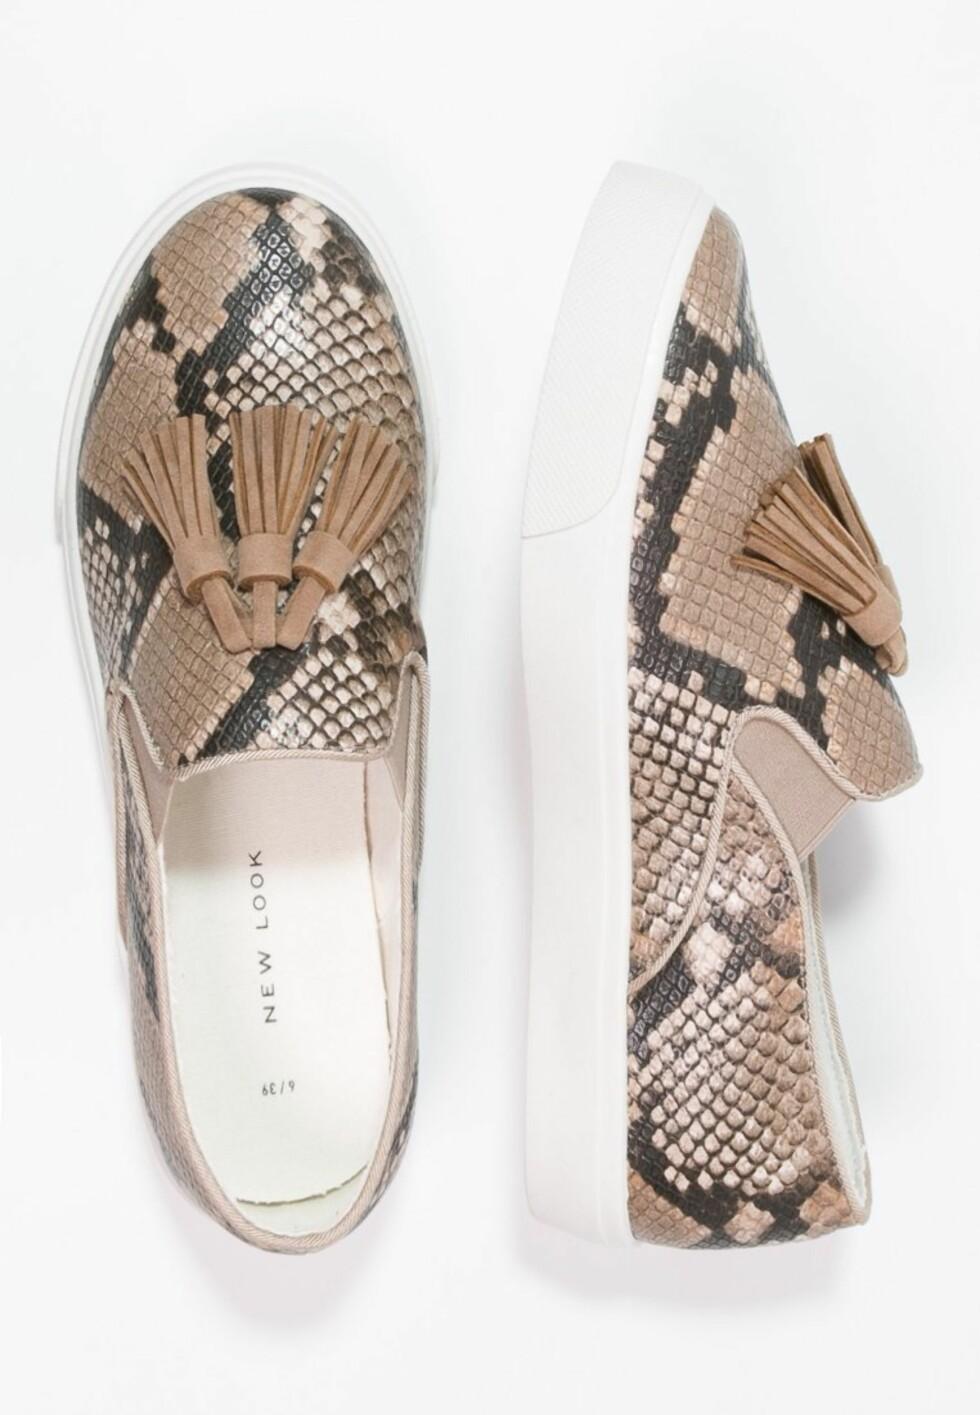 Sneakers fra New Look via Zalando.no, kr 249. Foto: Zalando.no